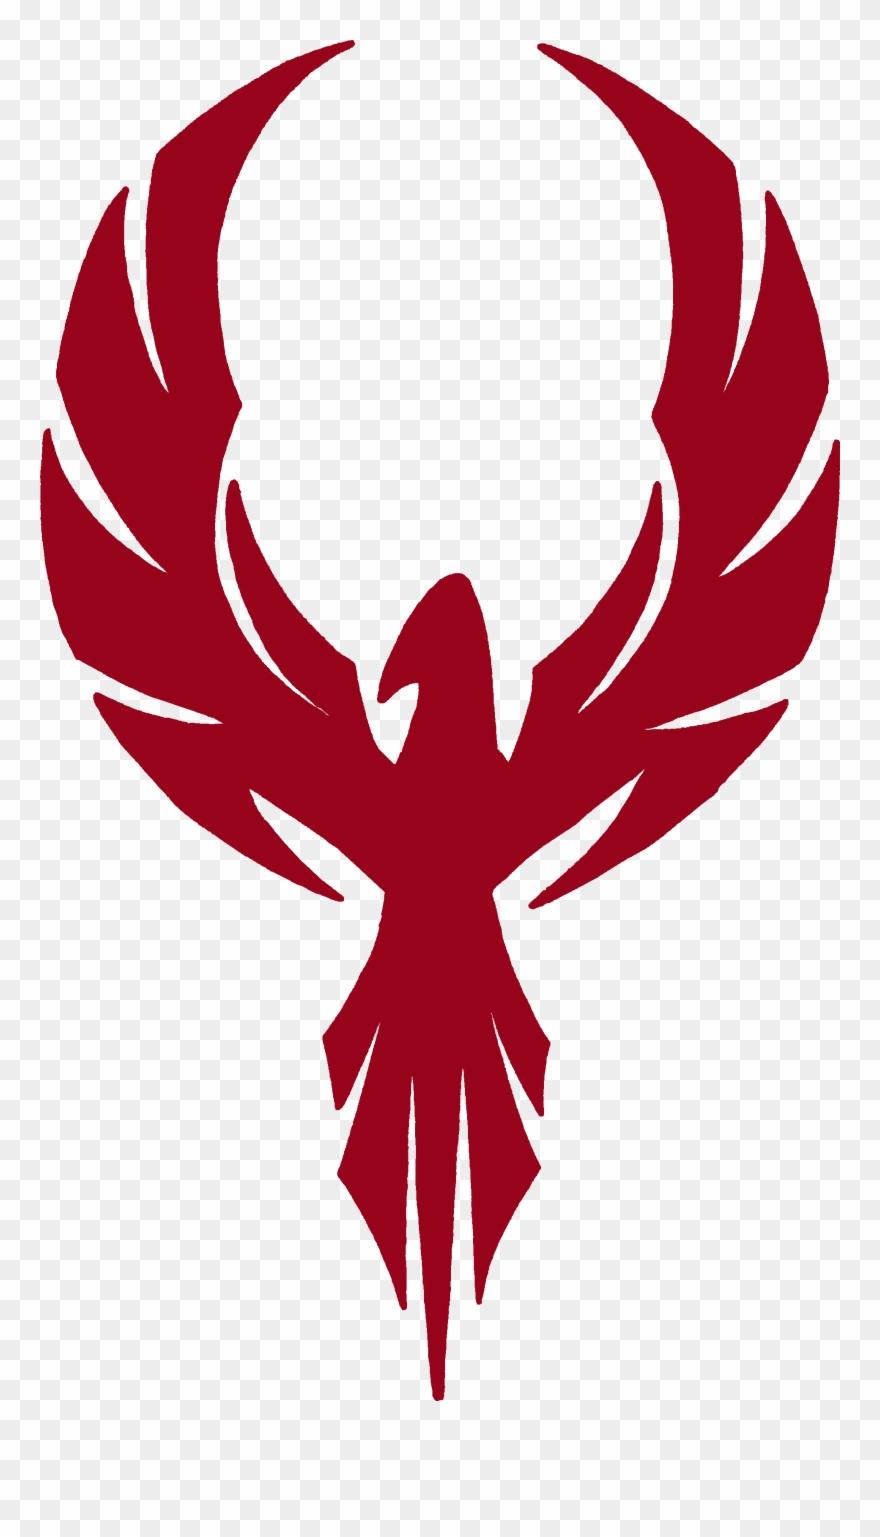 Pheoenix clipart jpg free Tribal Phoenix Rebellion Spray - Black And White Phoenix ... jpg free